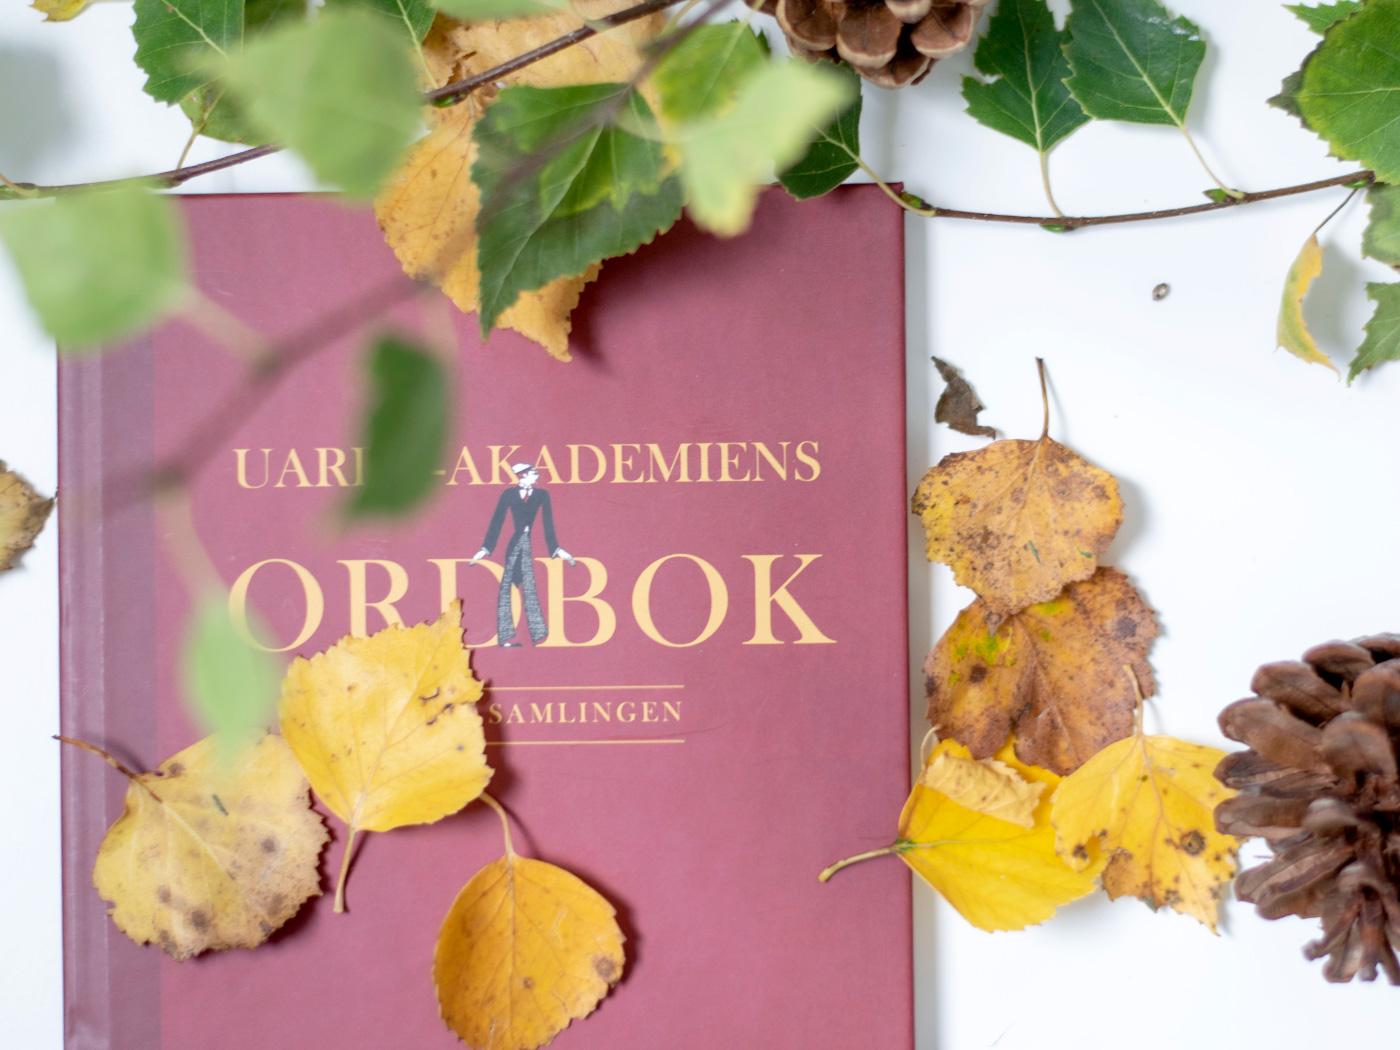 Uarda-Akademiens Ordbok - Elfte Upplagan - 2019